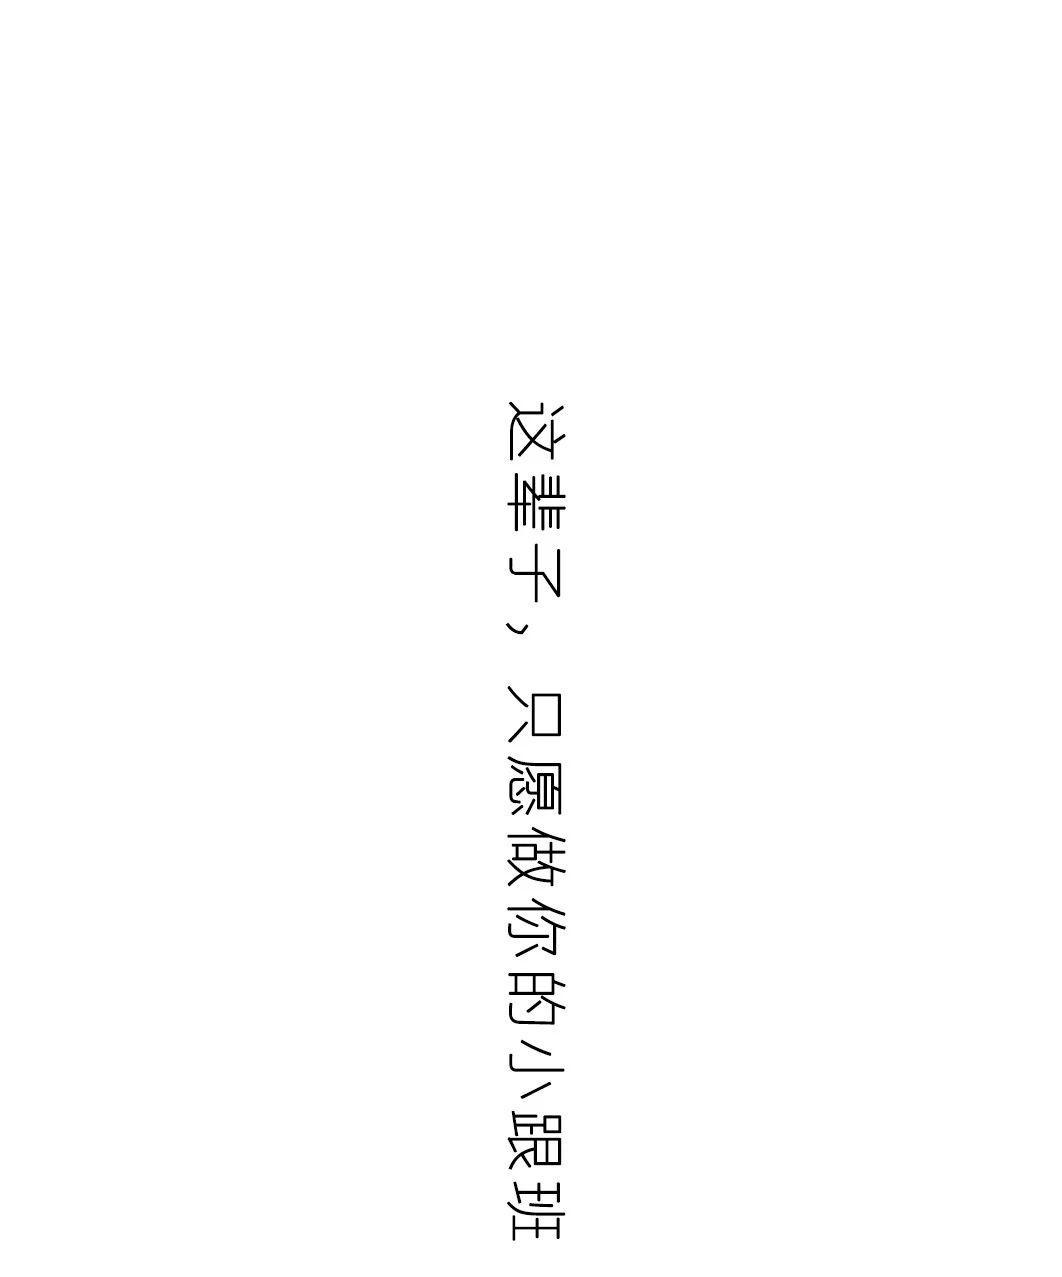 72e9c772fec61c19538283c08a14f451.jpg